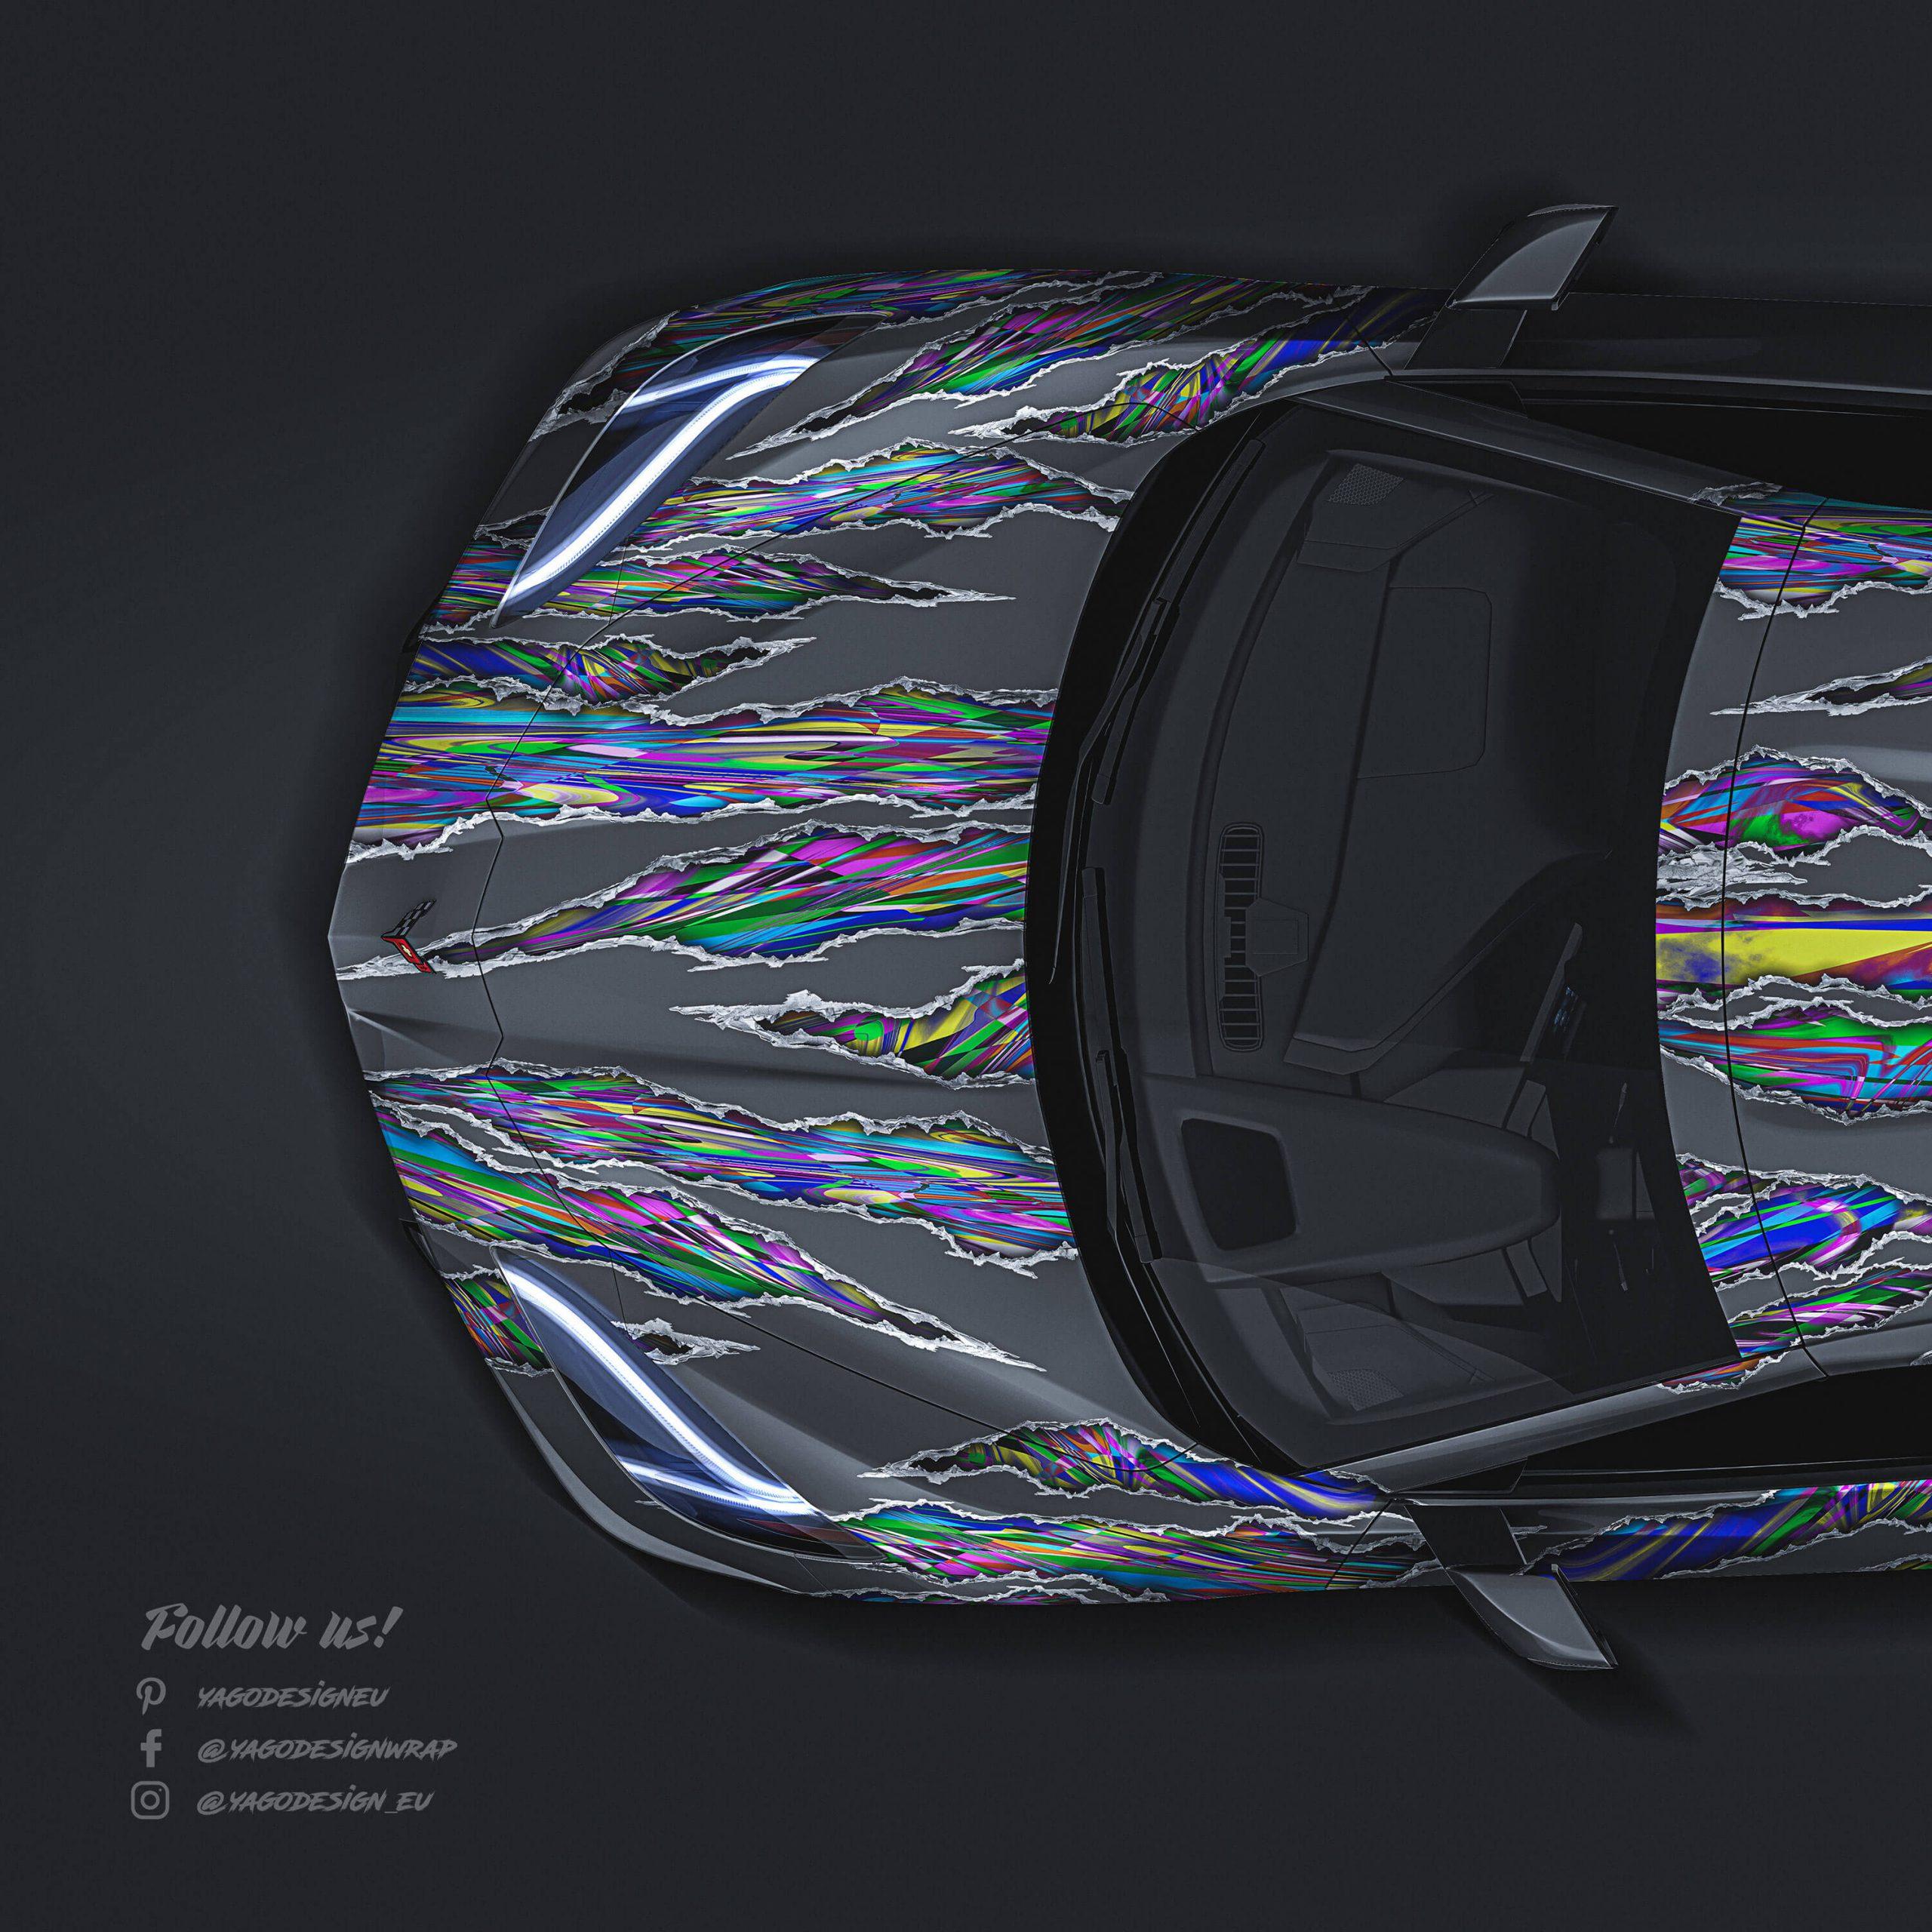 Chevrolet-Corvette-C8-Stingray-2020-by-Yagodesign-2019-front-up-scaled